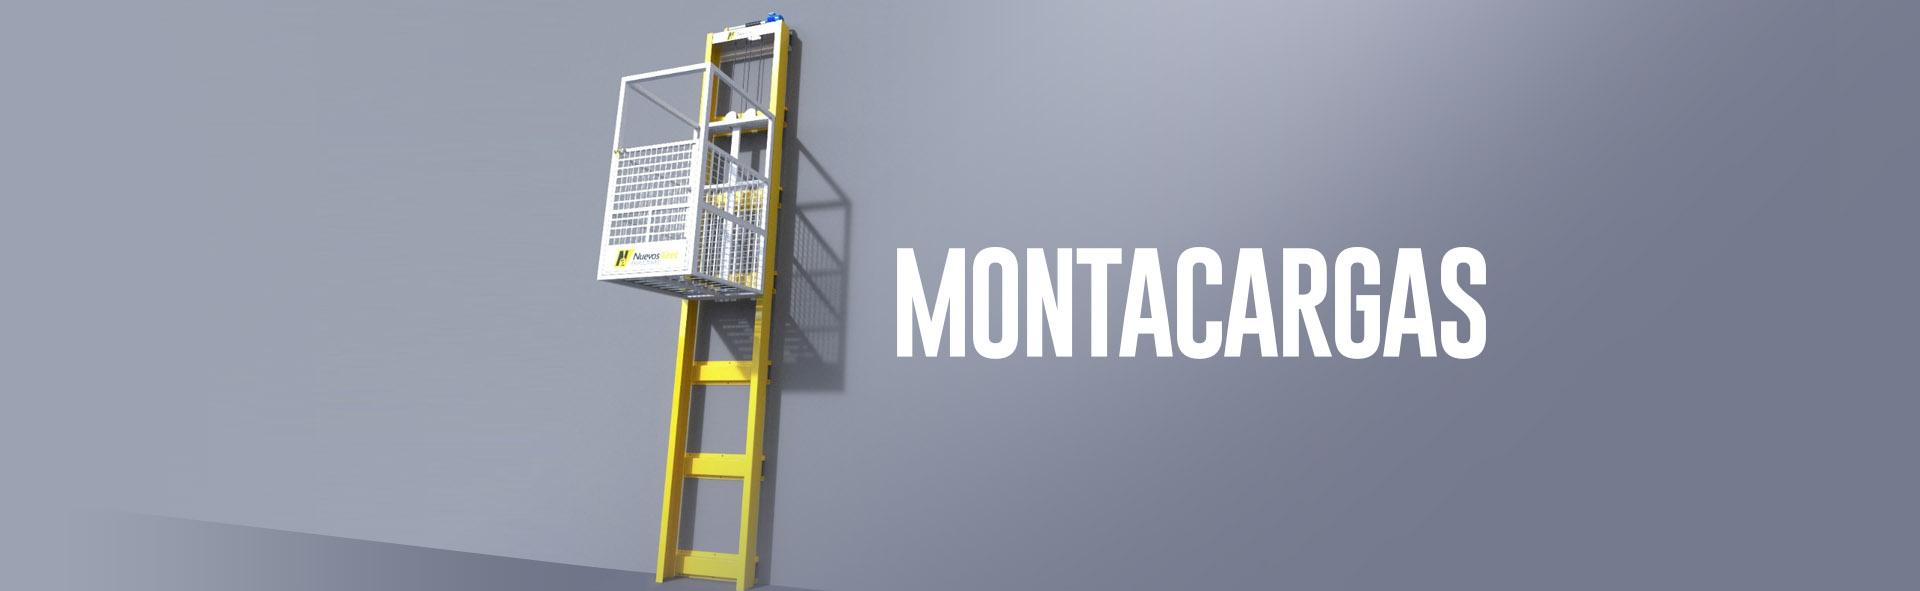 003 – Montacargas nuevos aires net